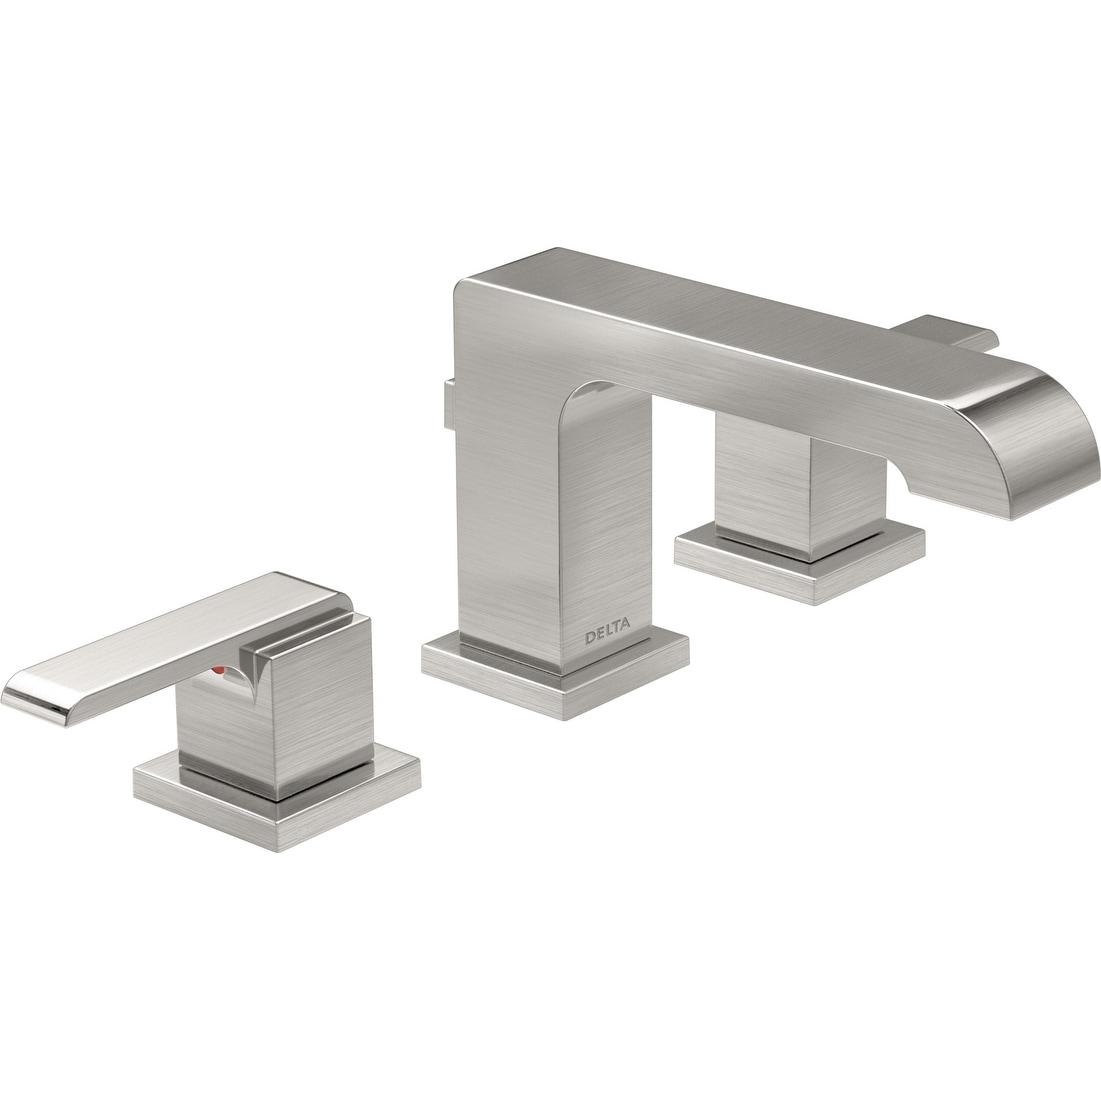 Delta Bathroom Faucets.Shop Delta 3567 Mpu Dst Ara 1 2 Gpm Widespread Bathroom Faucet